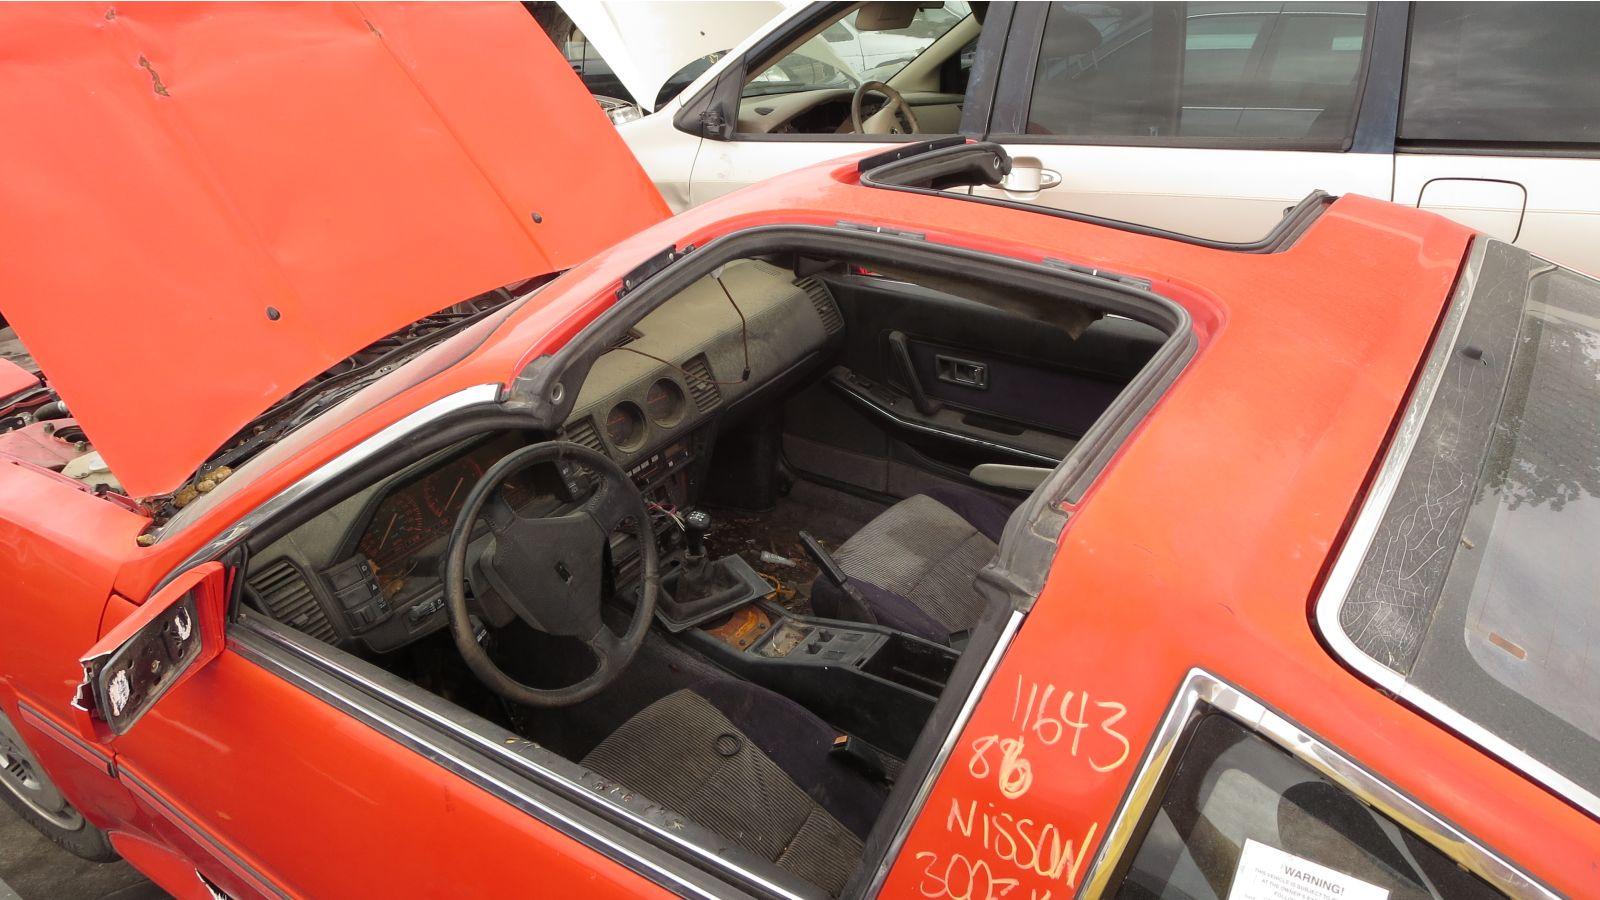 Junkyard Gem, Datsun by Nissan edition: 1988 Nissan 300ZX - Autoblog